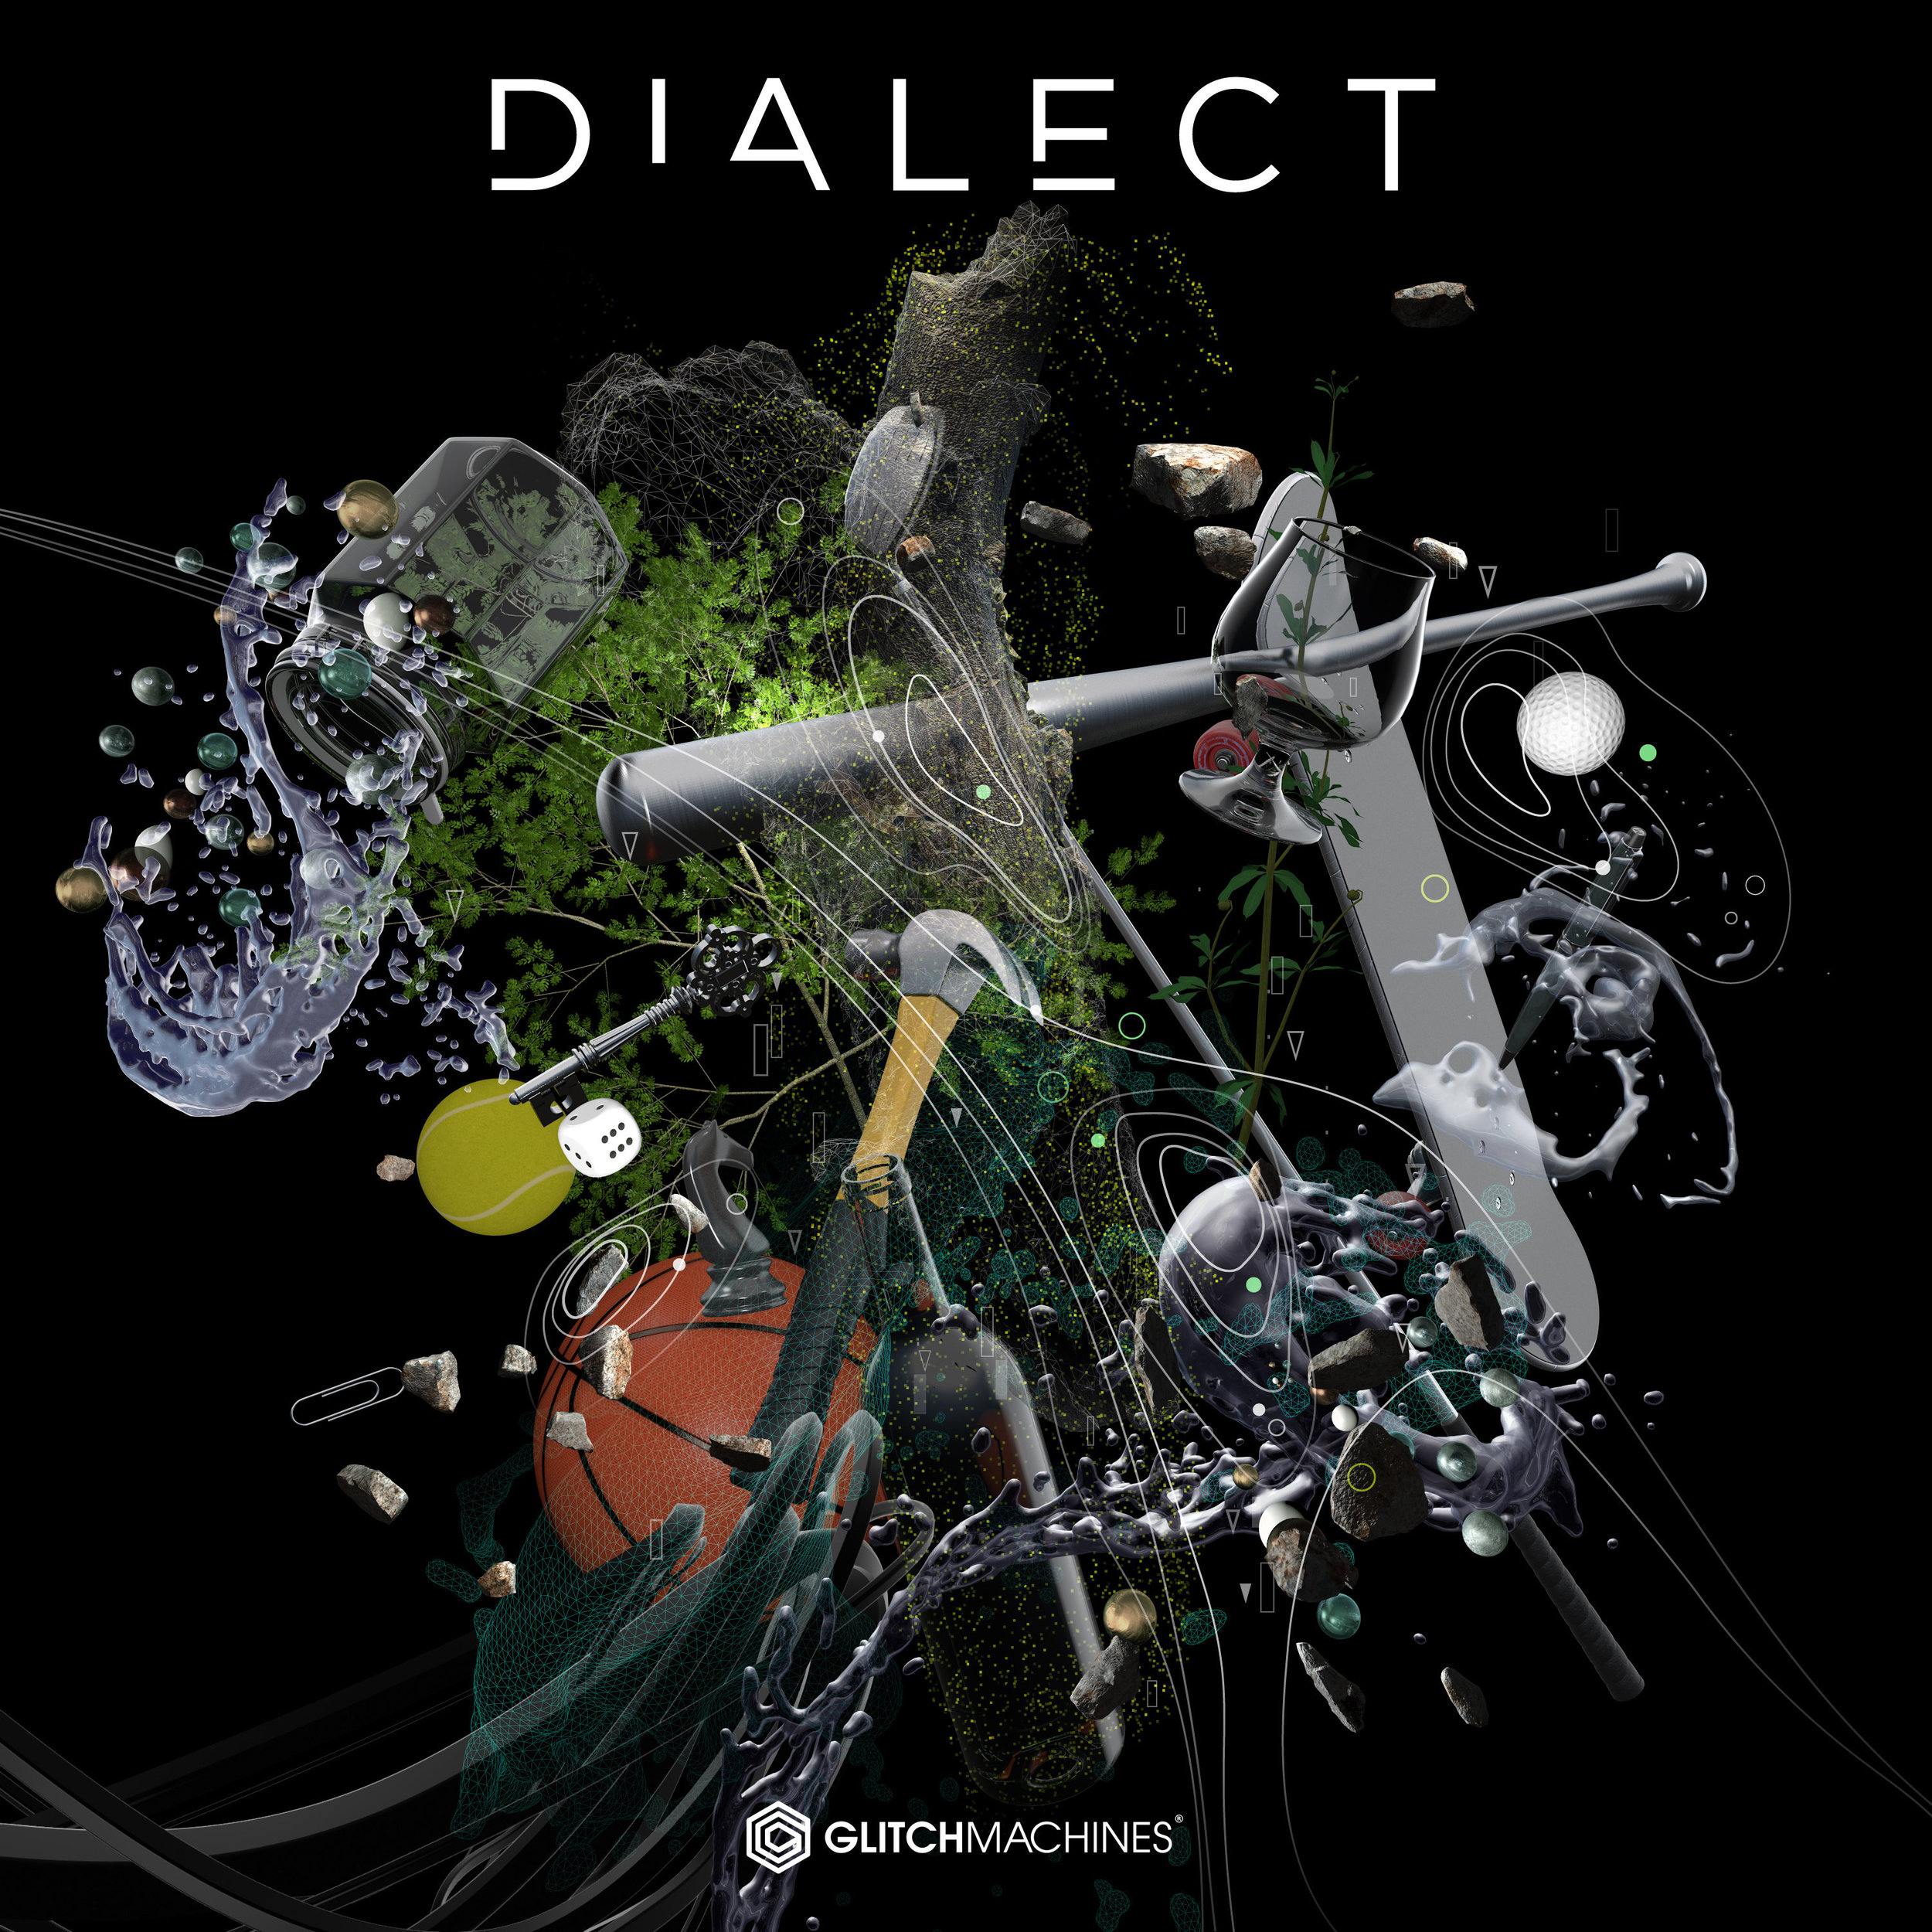 DIALECT-3000-LOGO-WEB.jpg